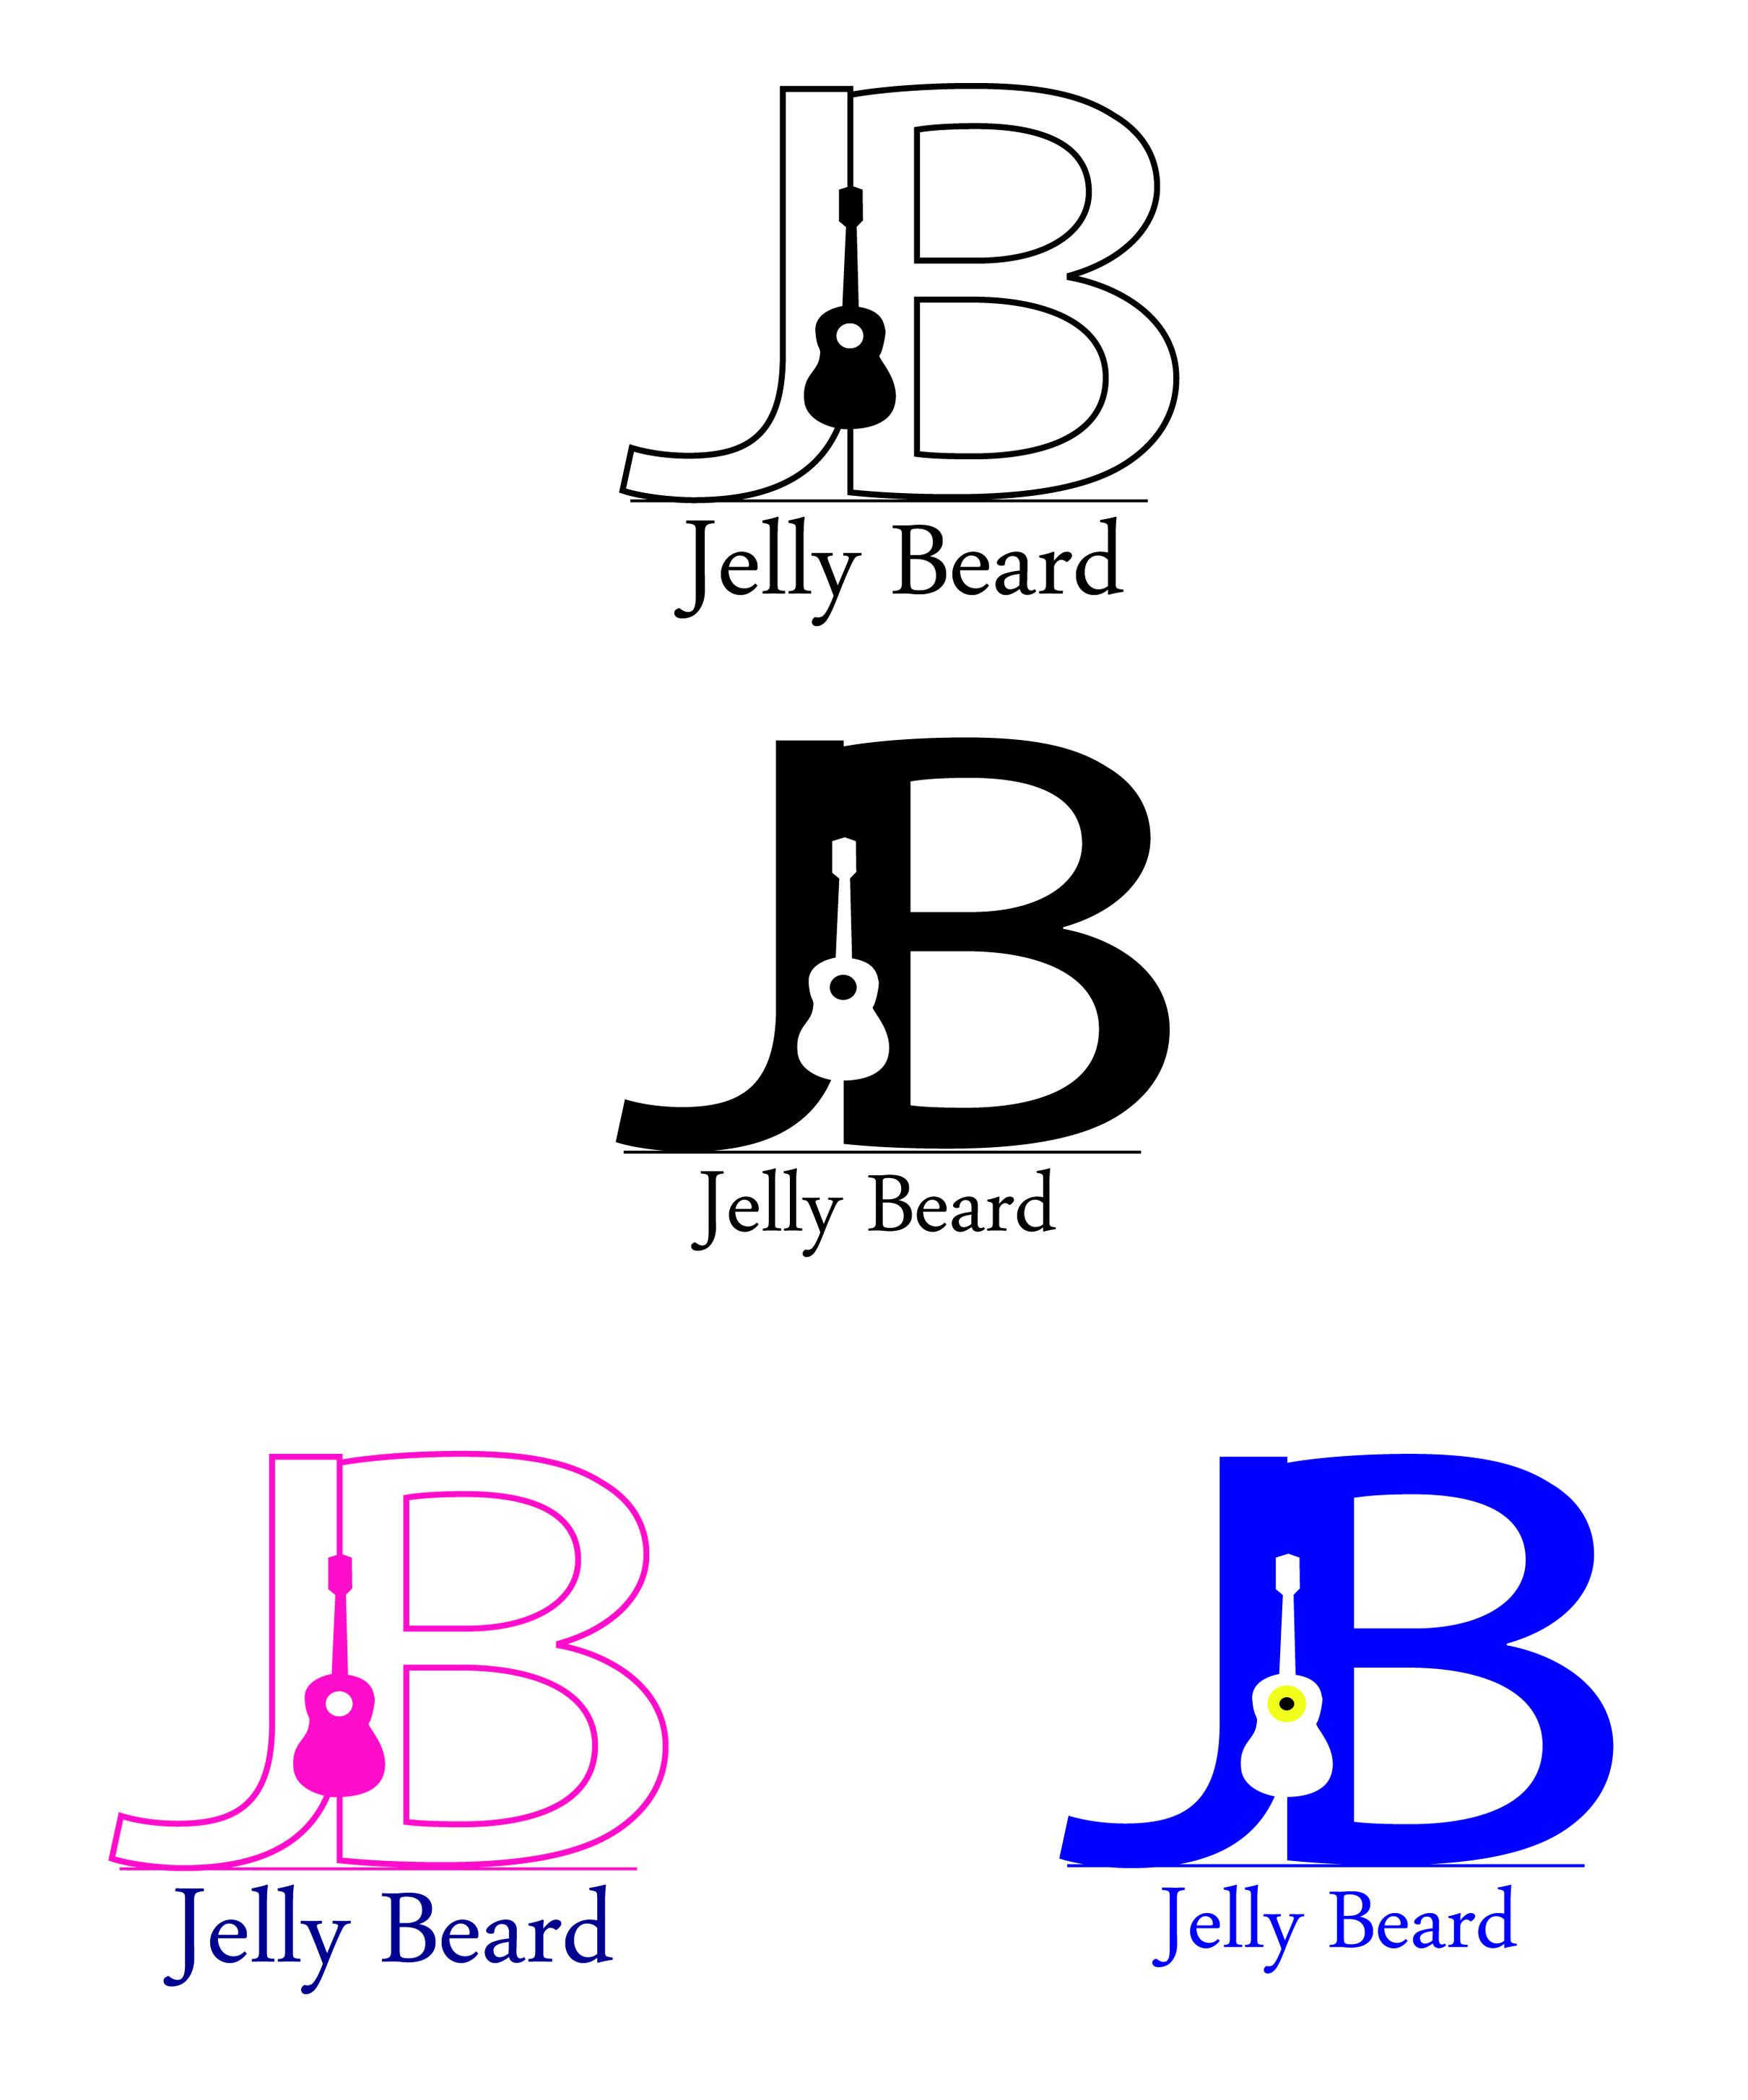 Logo Design by V Anil Yadavv - Entry No. 57 in the Logo Design Contest jellybeard Logo Design.